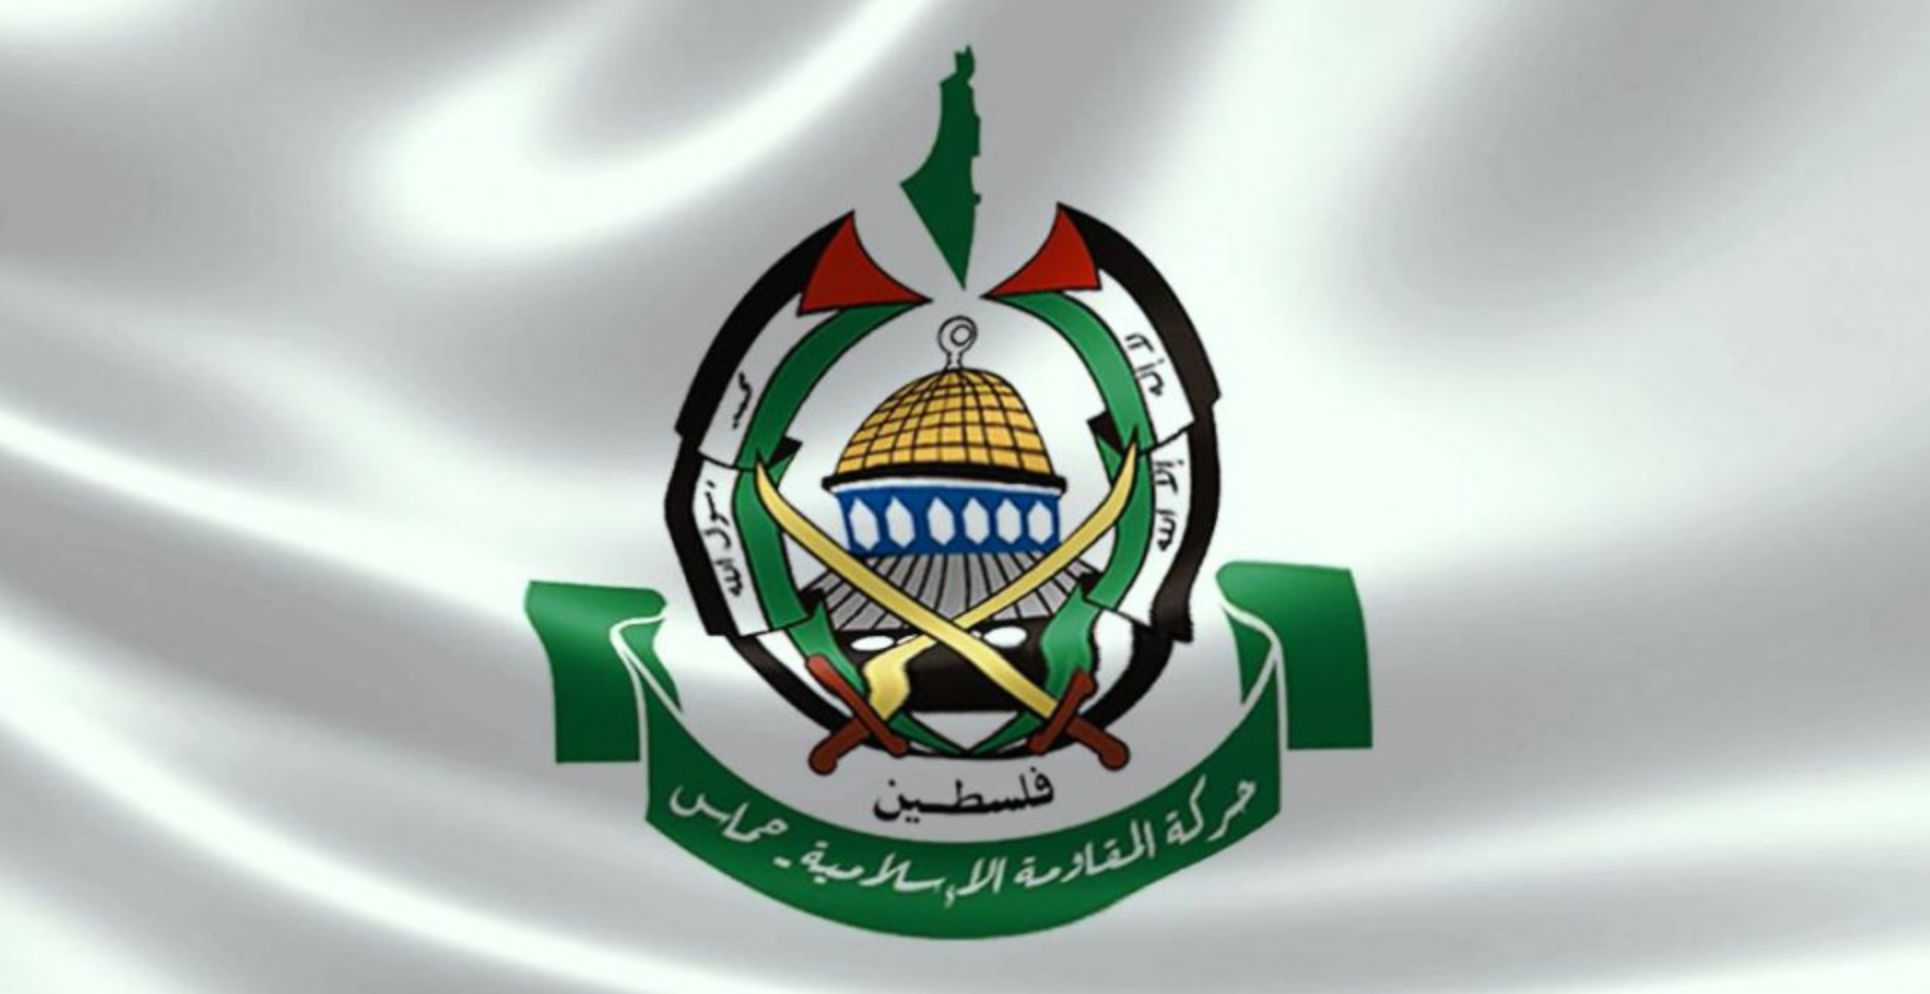 "Photo of حركة حماس تنفي تقارير تكلمت عن صلتها ب""فلسطينية جليانة"""